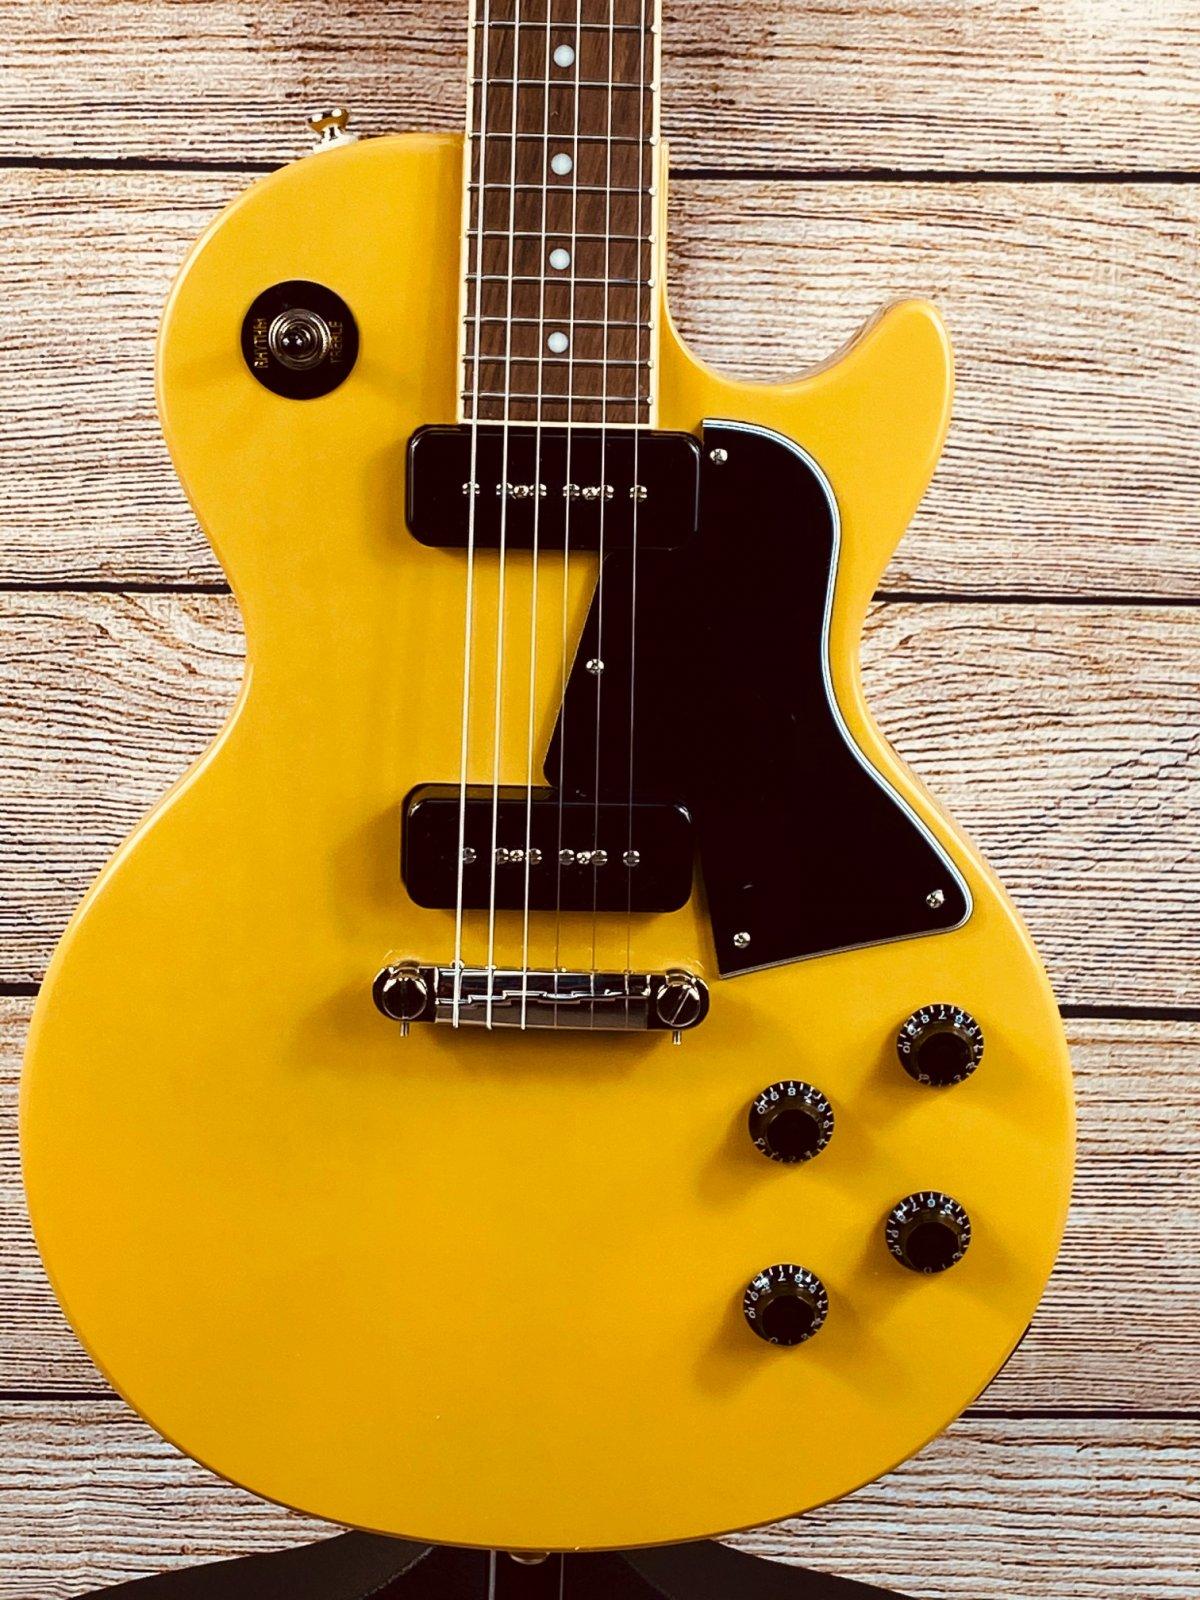 Epiphone Les Paul Special Electric Guitar - TV Yellow